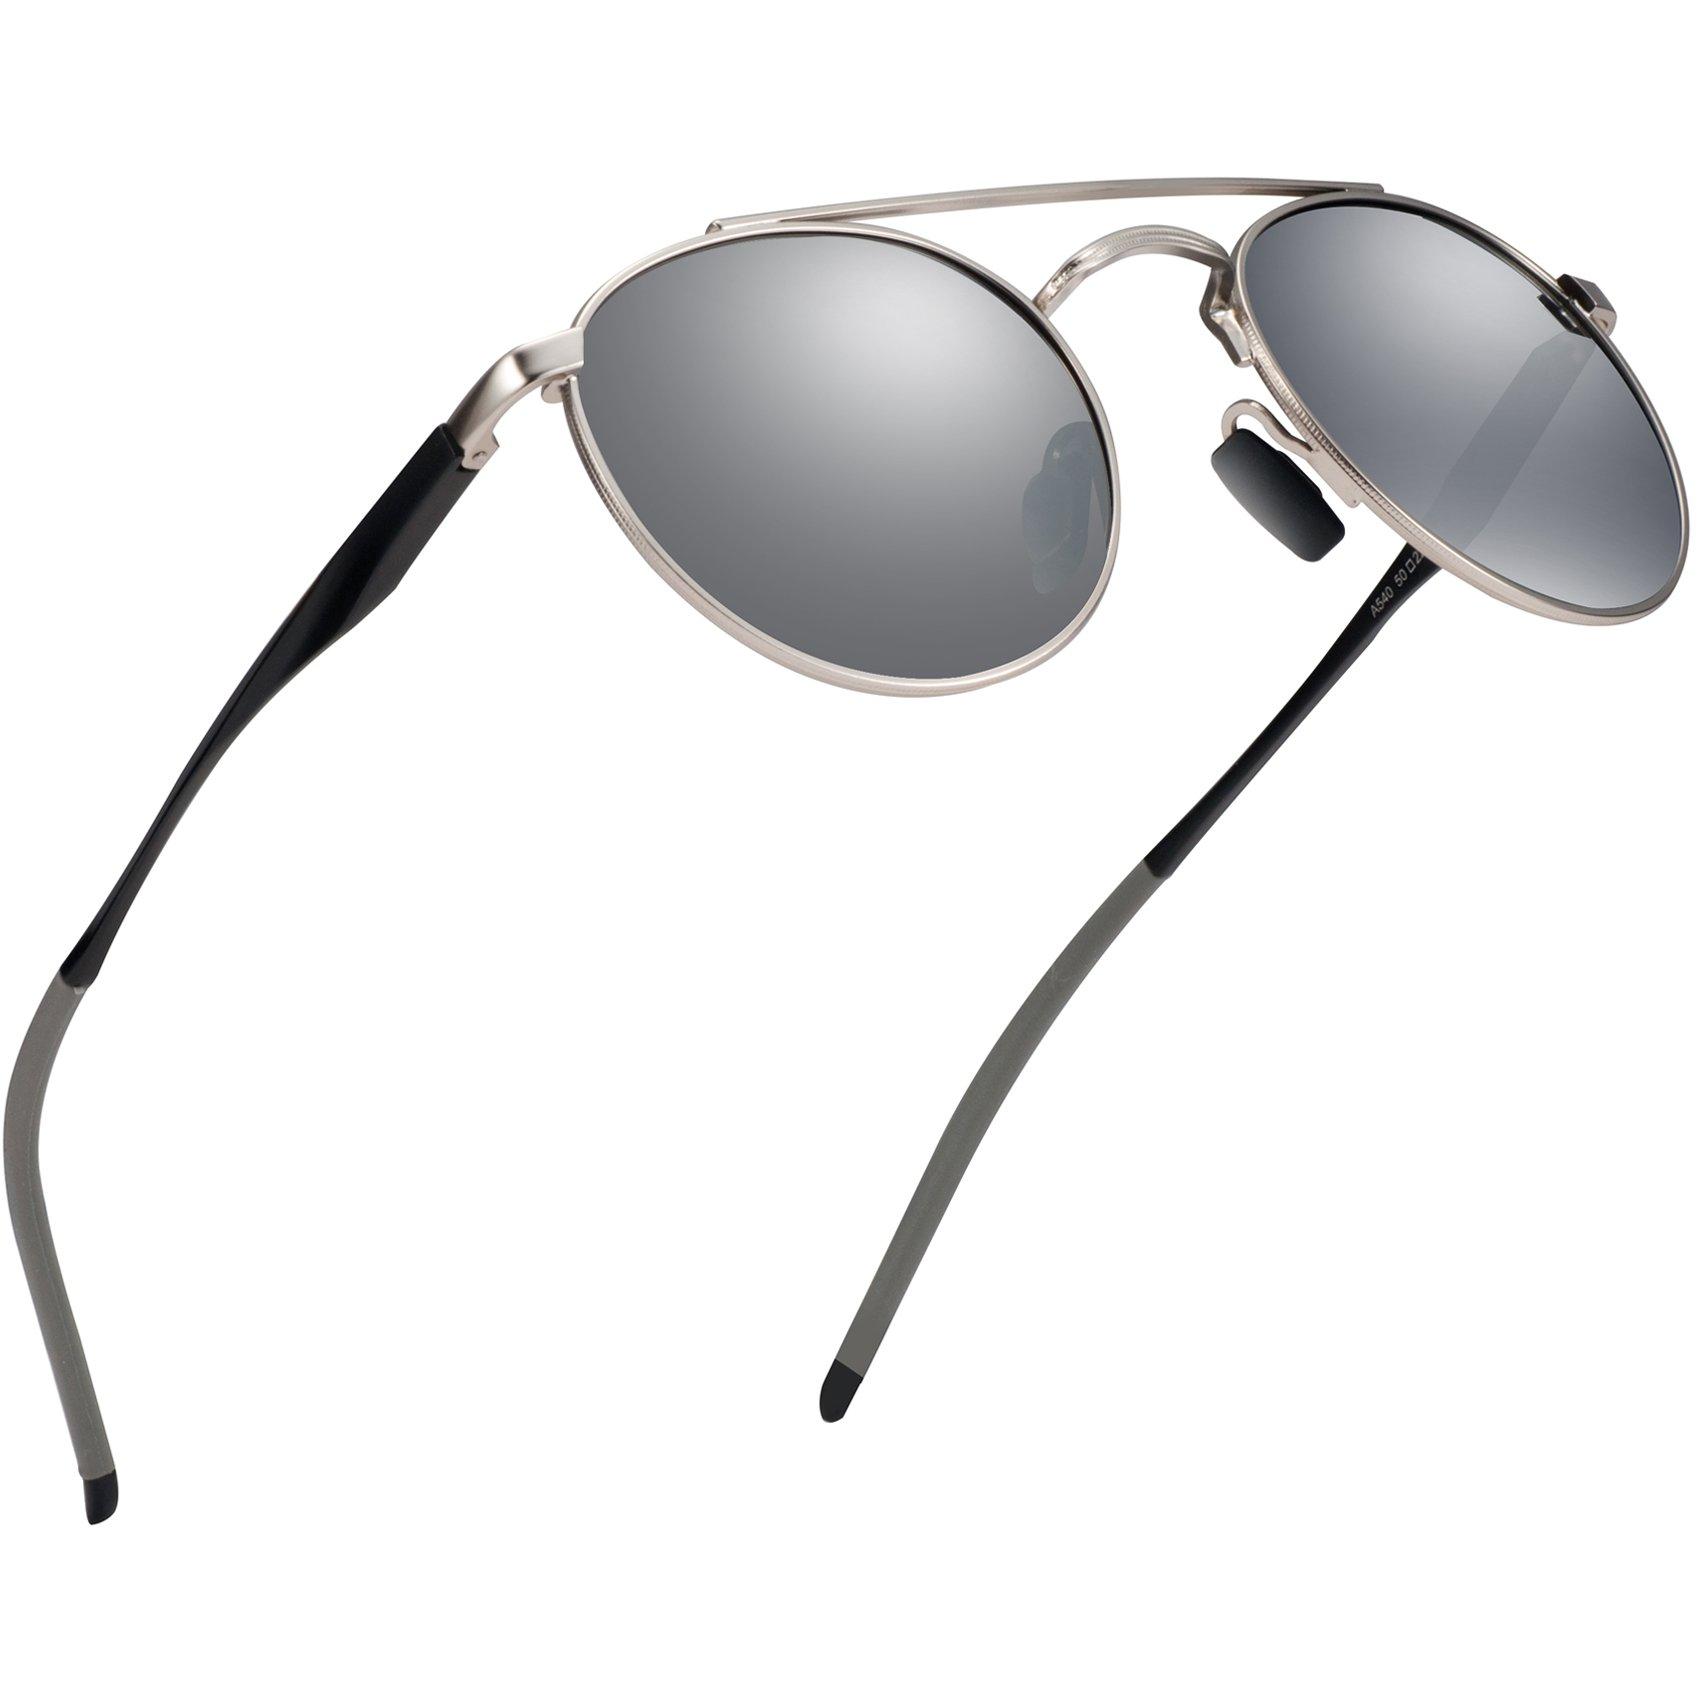 Polarized Sunglasses Aviator Sunglasses for Men - FEIDU Polarized Aviator Sunglasses for Men Sunglasses Man FD3014 (silver) by FEIDU